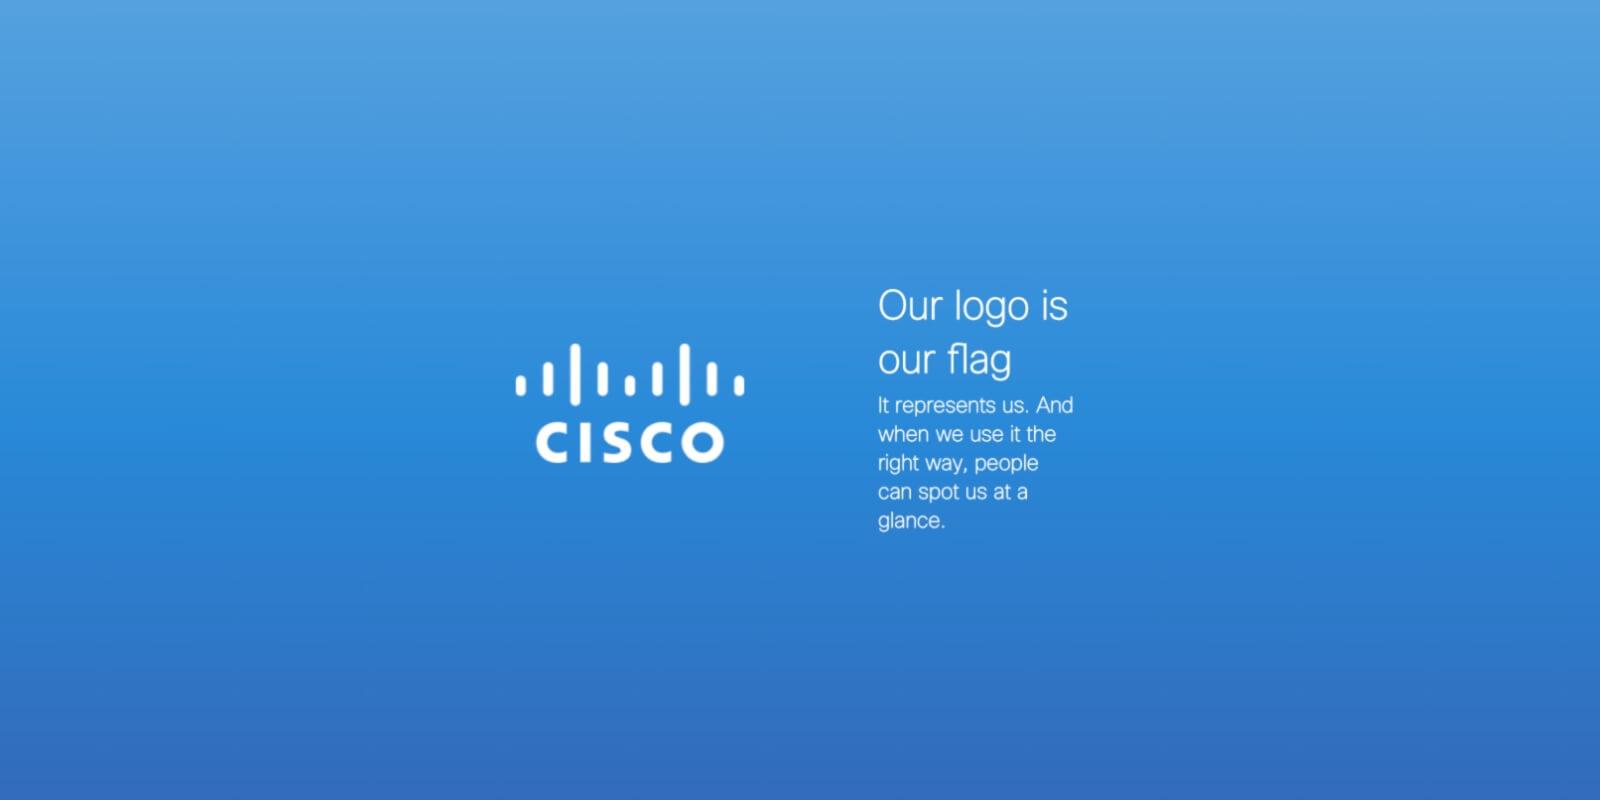 Cisco's interactive brand book